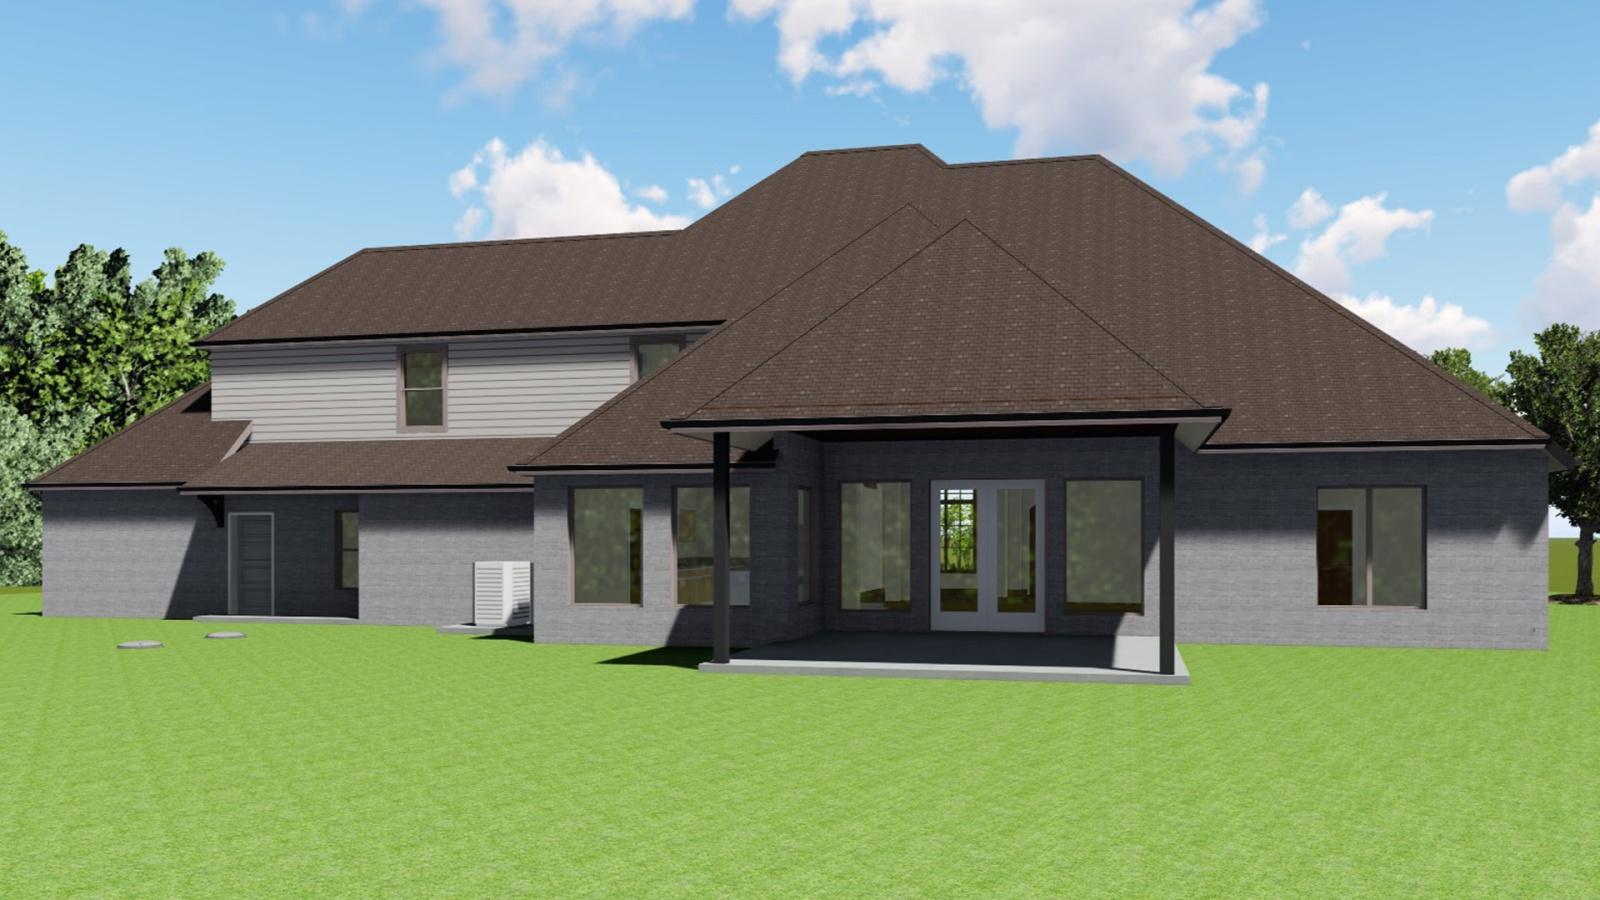 4 Bedrooms Bedrooms, ,4 BathroomsBathrooms,Custom Home,Home Plans,1012